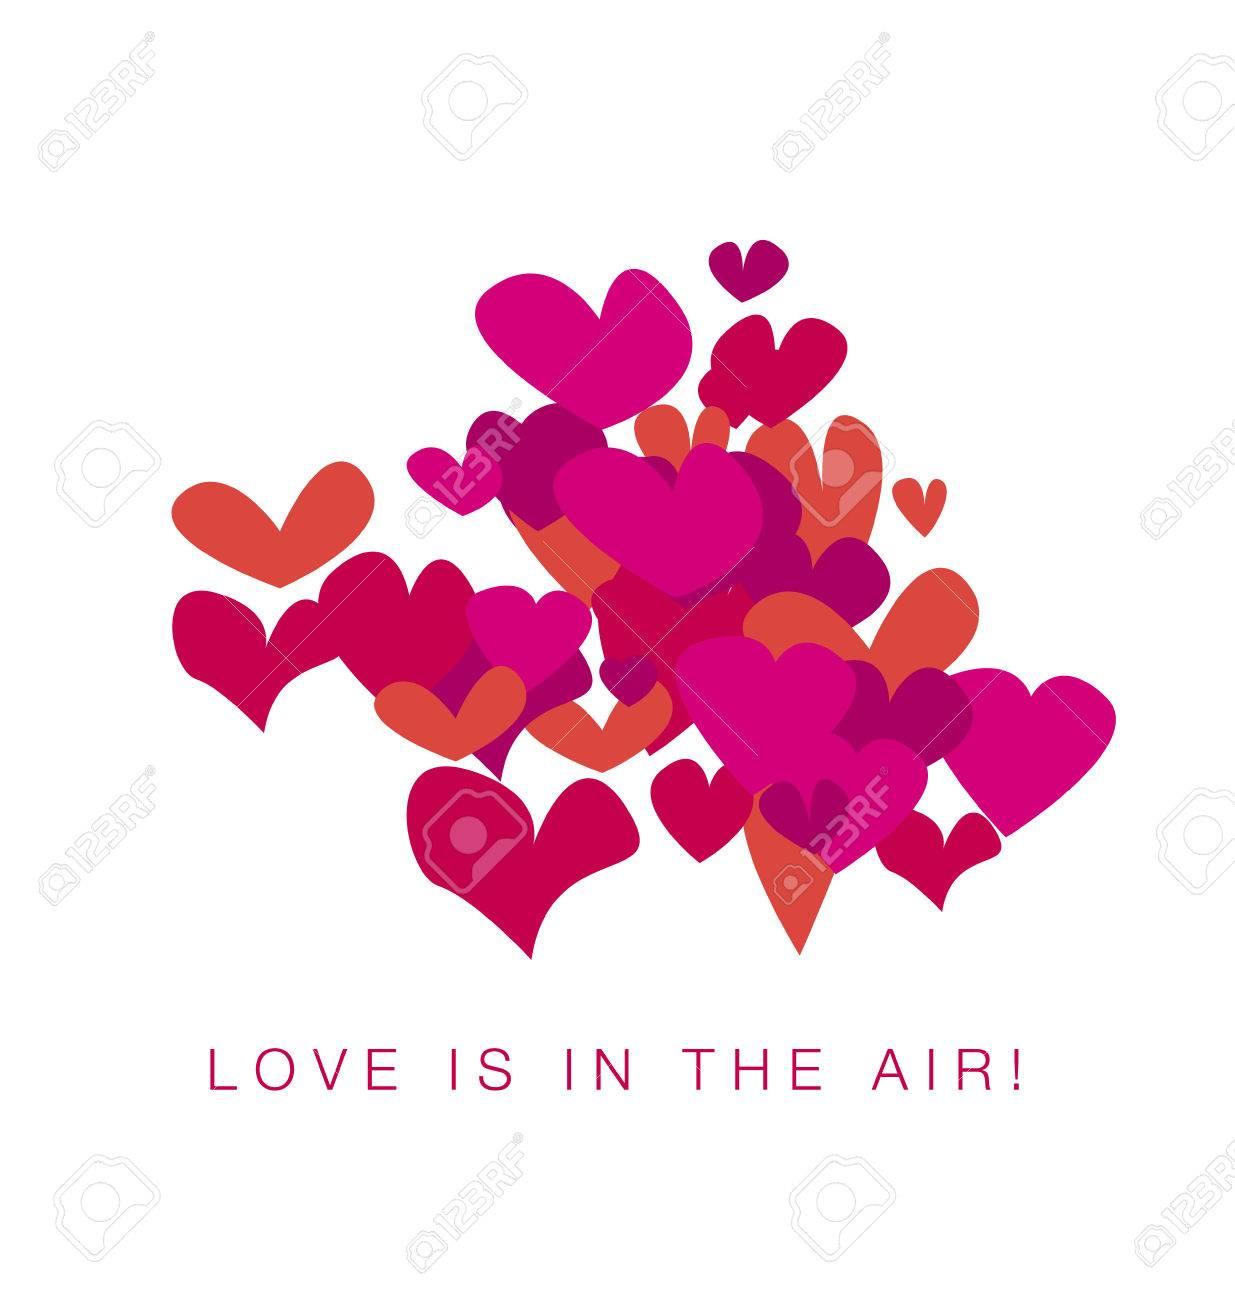 Fantastic Vida Valentine Ideas   Valentine Gift Ideas   Briotel.com